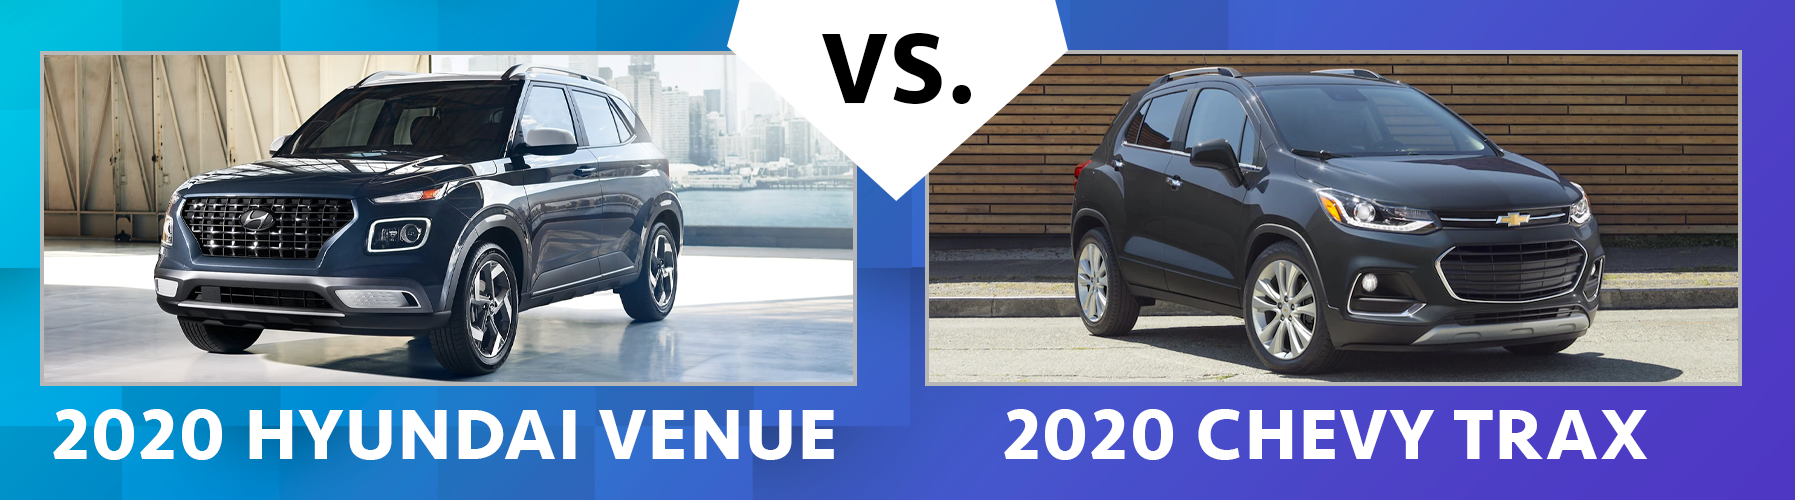 2020 Hyundai Venue vs 2020 Chevy Trax Comparisons